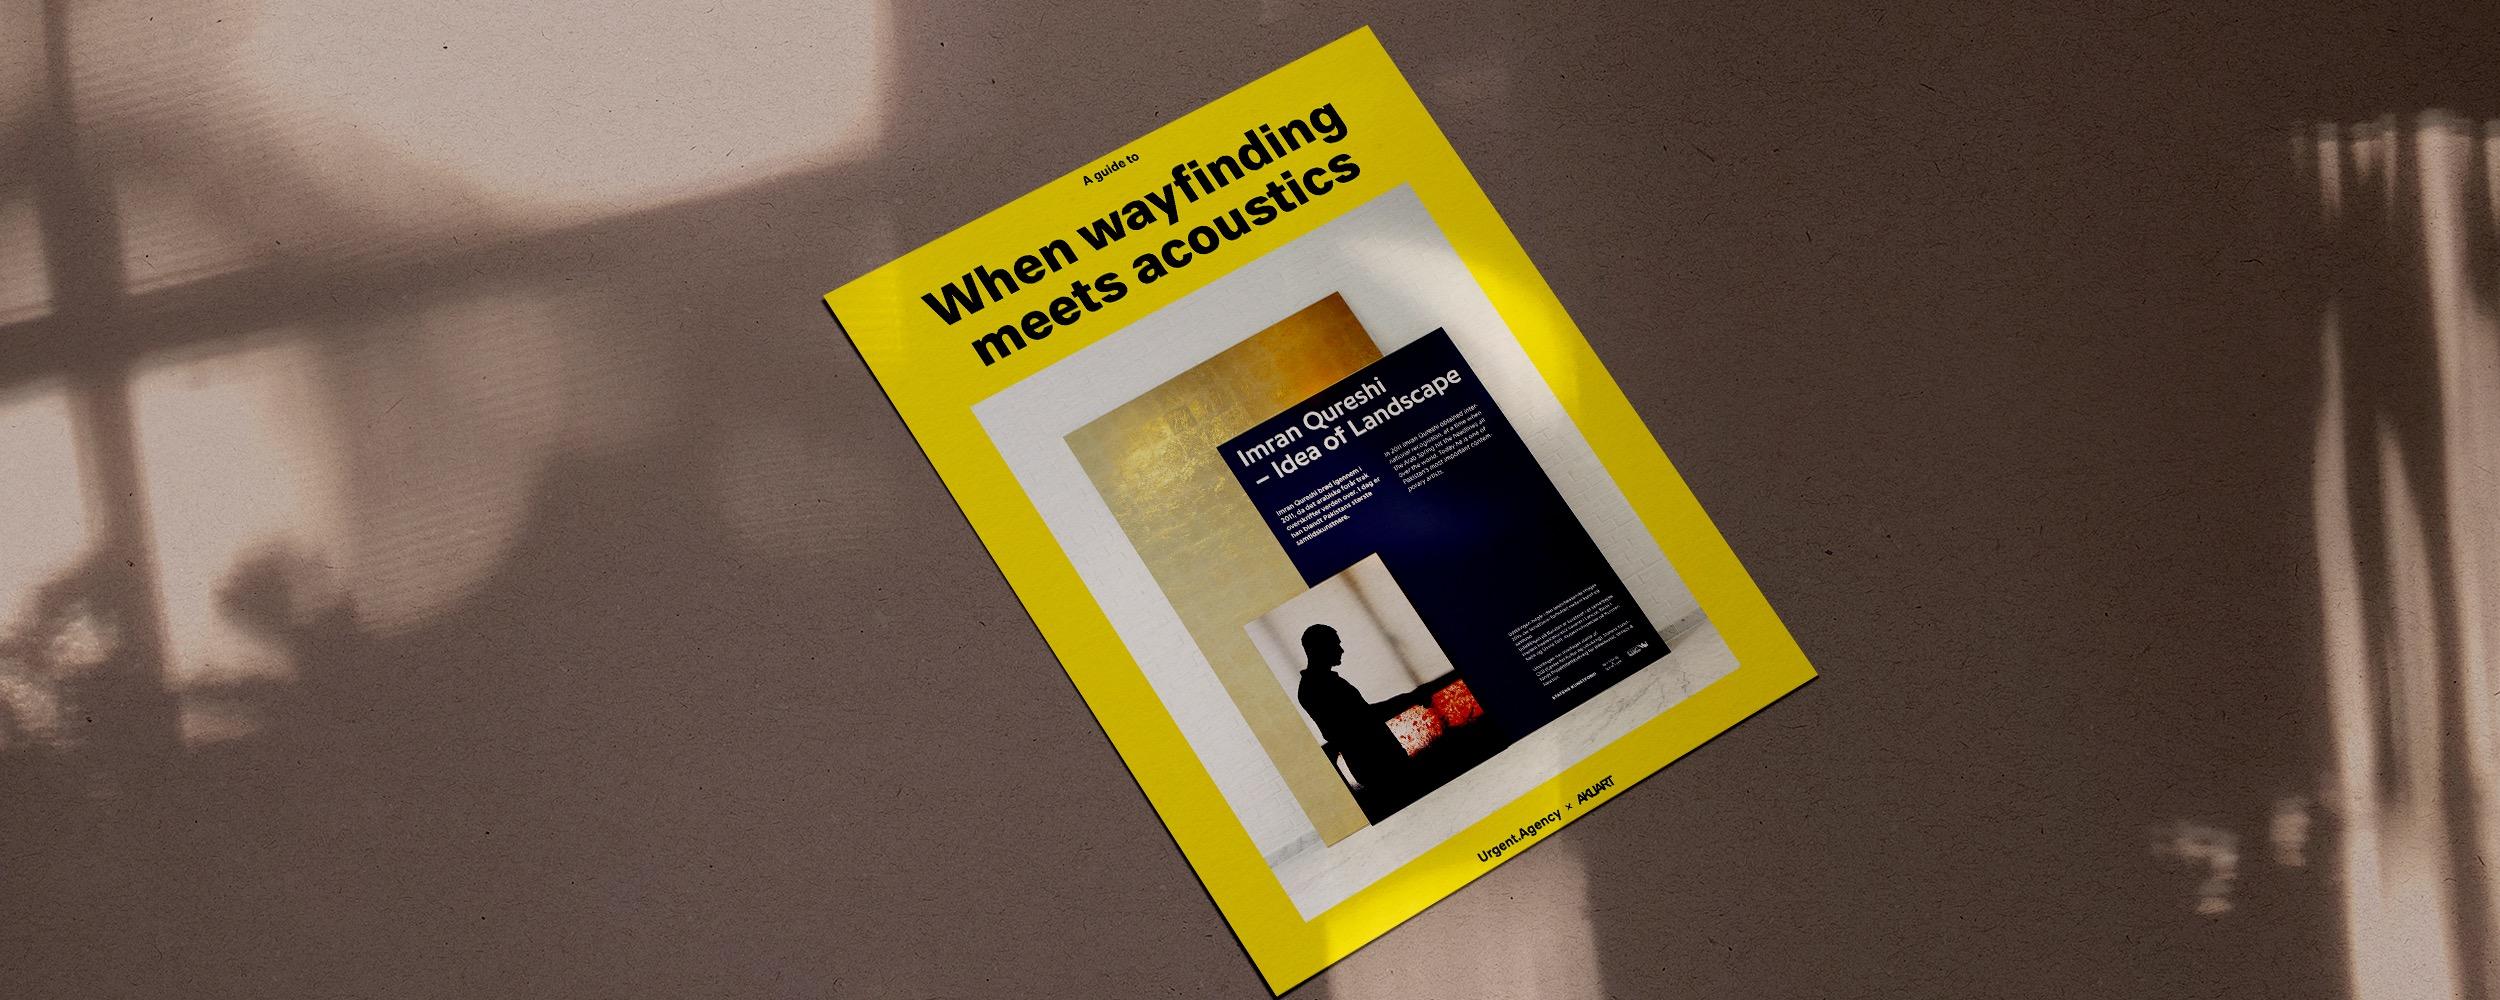 Gul pamflet hvorpå der står When wayfinding meets acoustics